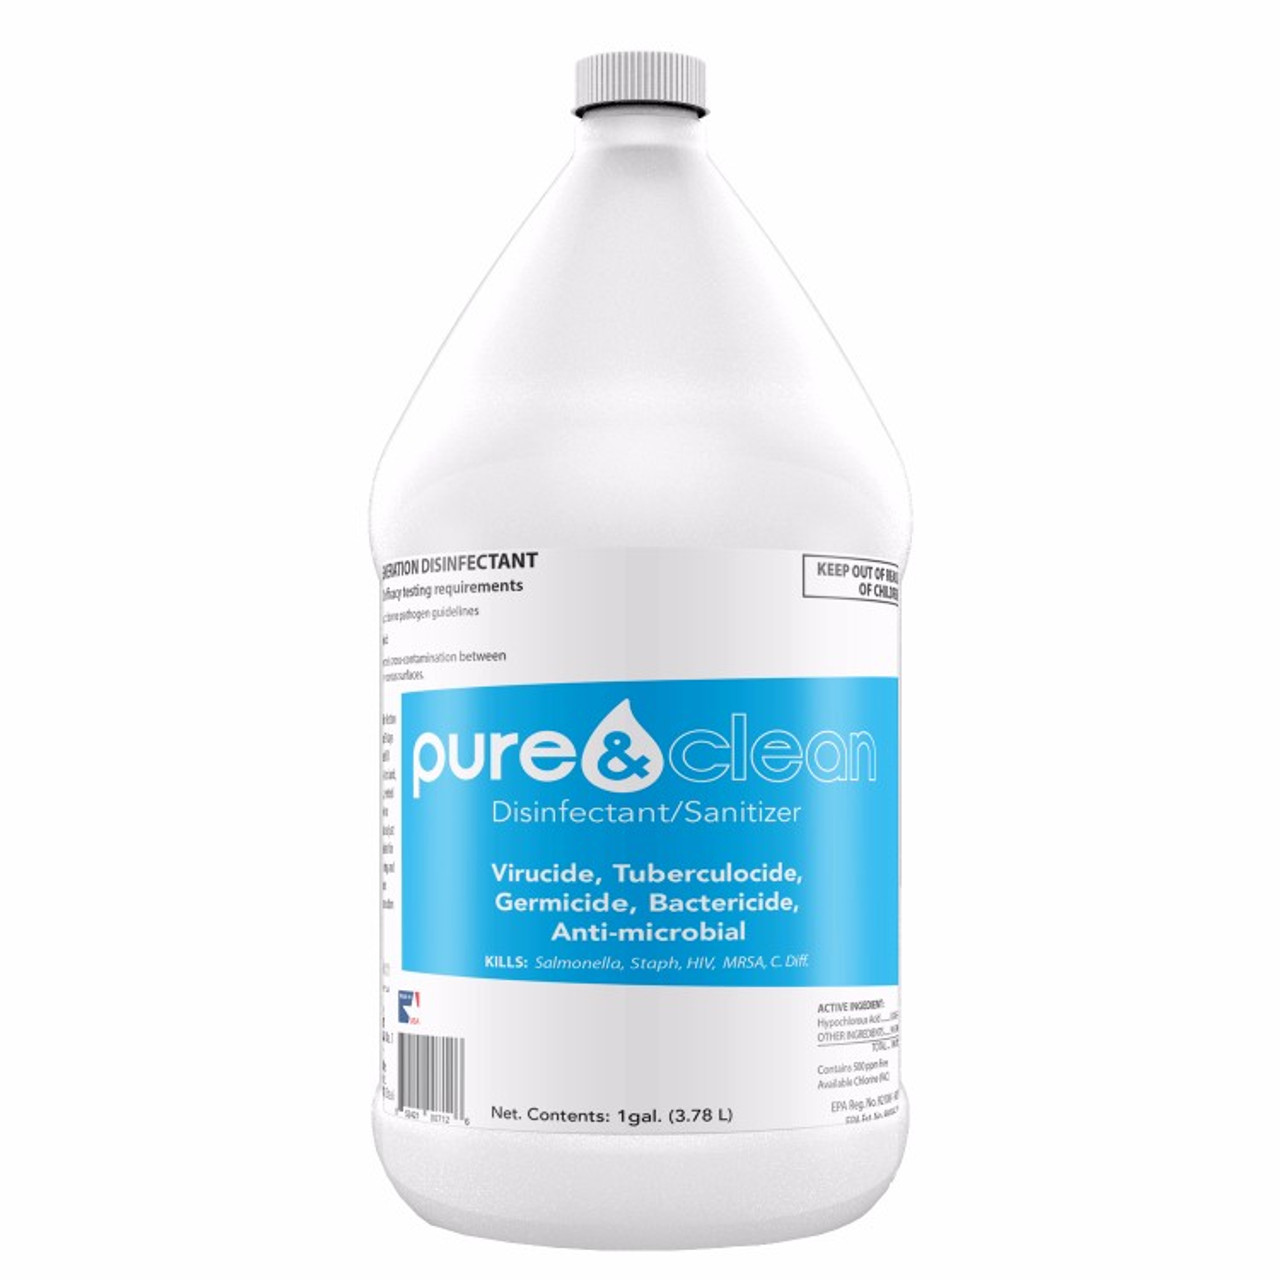 Hypochlorous Acid - 460 ppm HOCl (1 case - total 4 gallons)